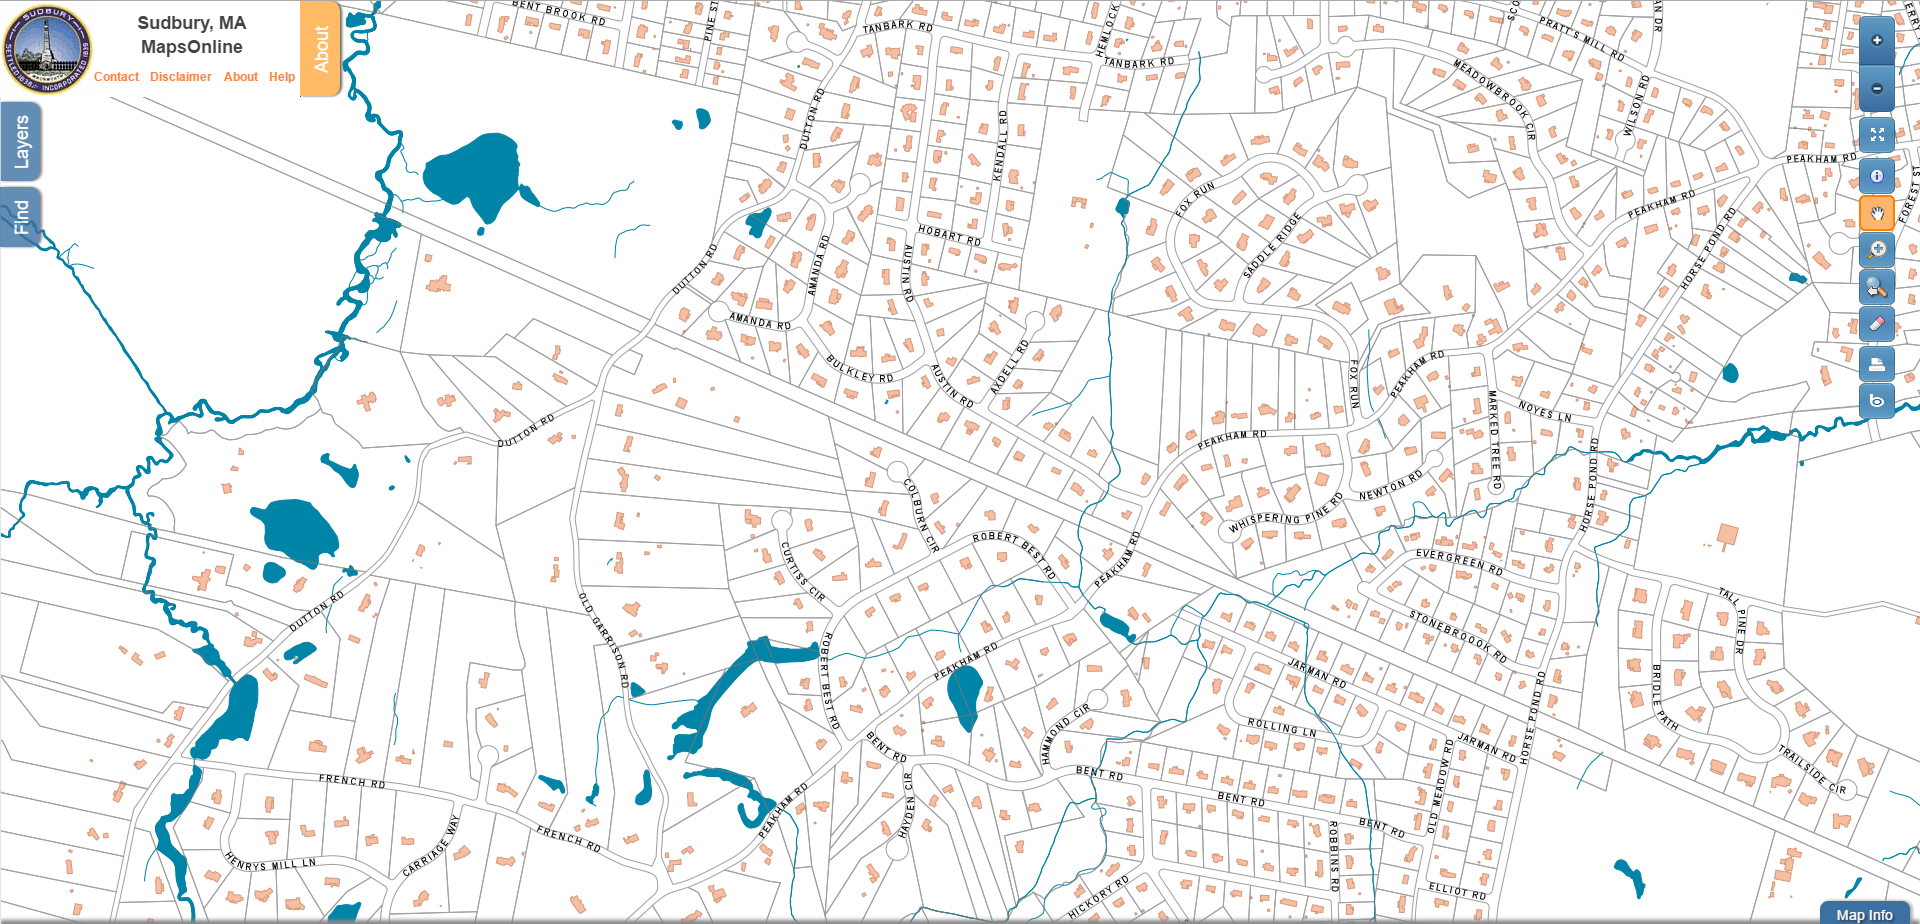 Maps Protect Sudbury